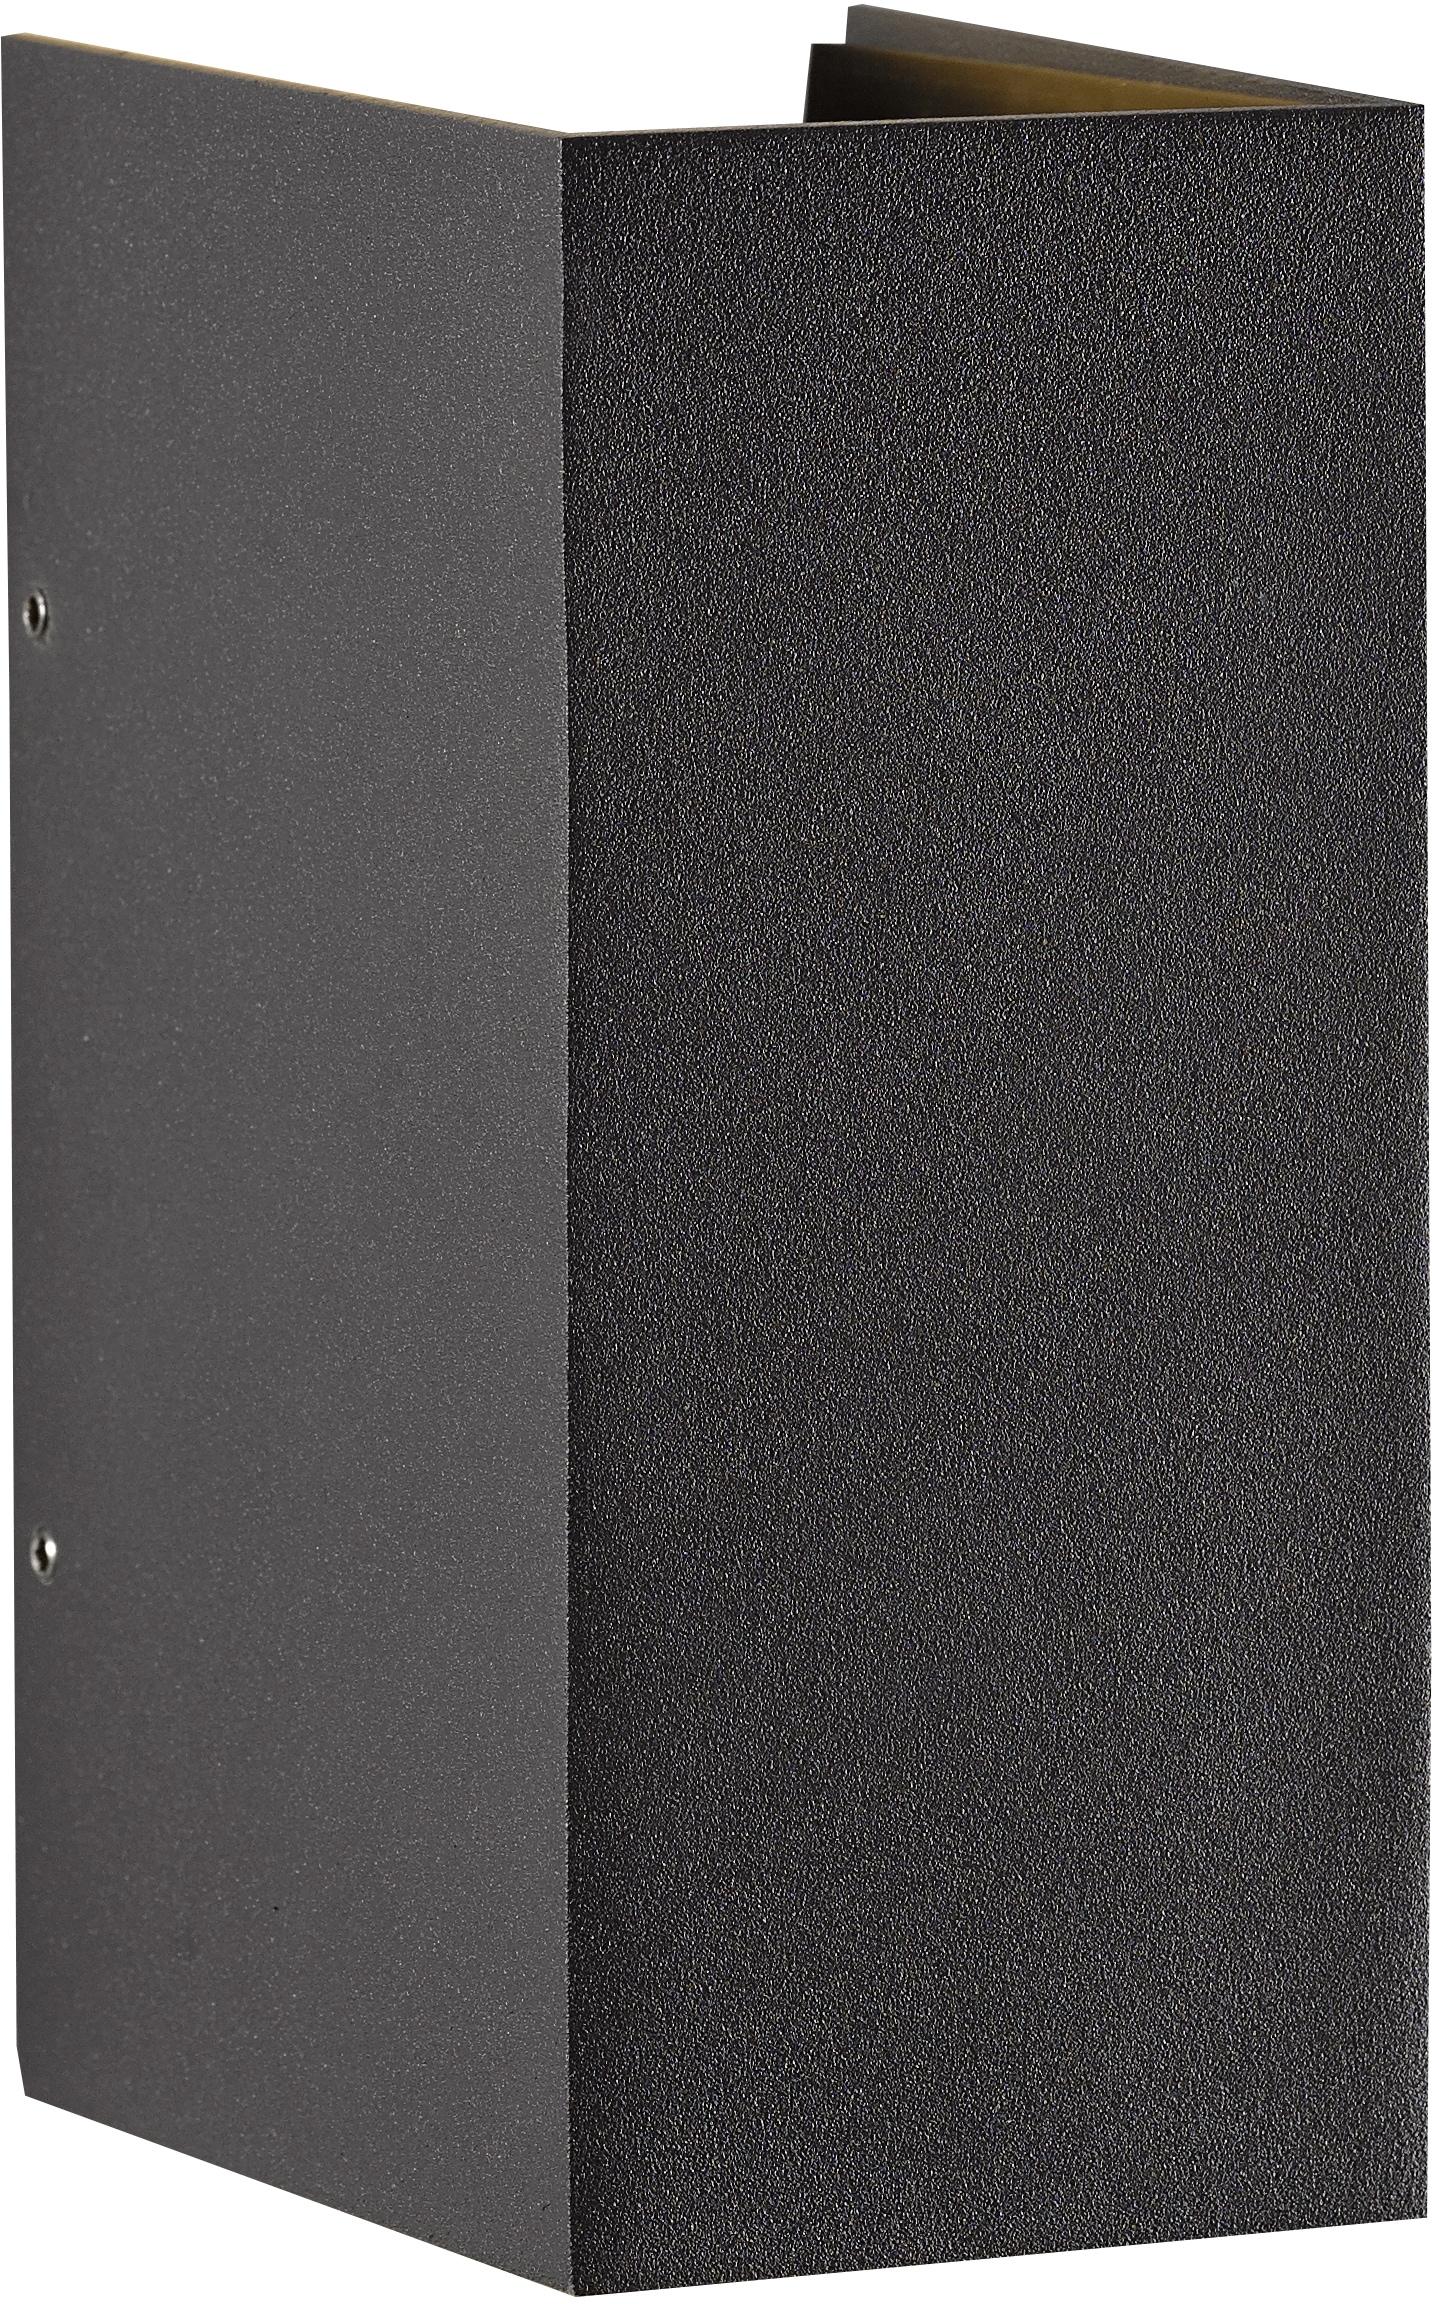 Nordlux LED Außen-Wandleuchte Norma, LED-Board, Warmweiß